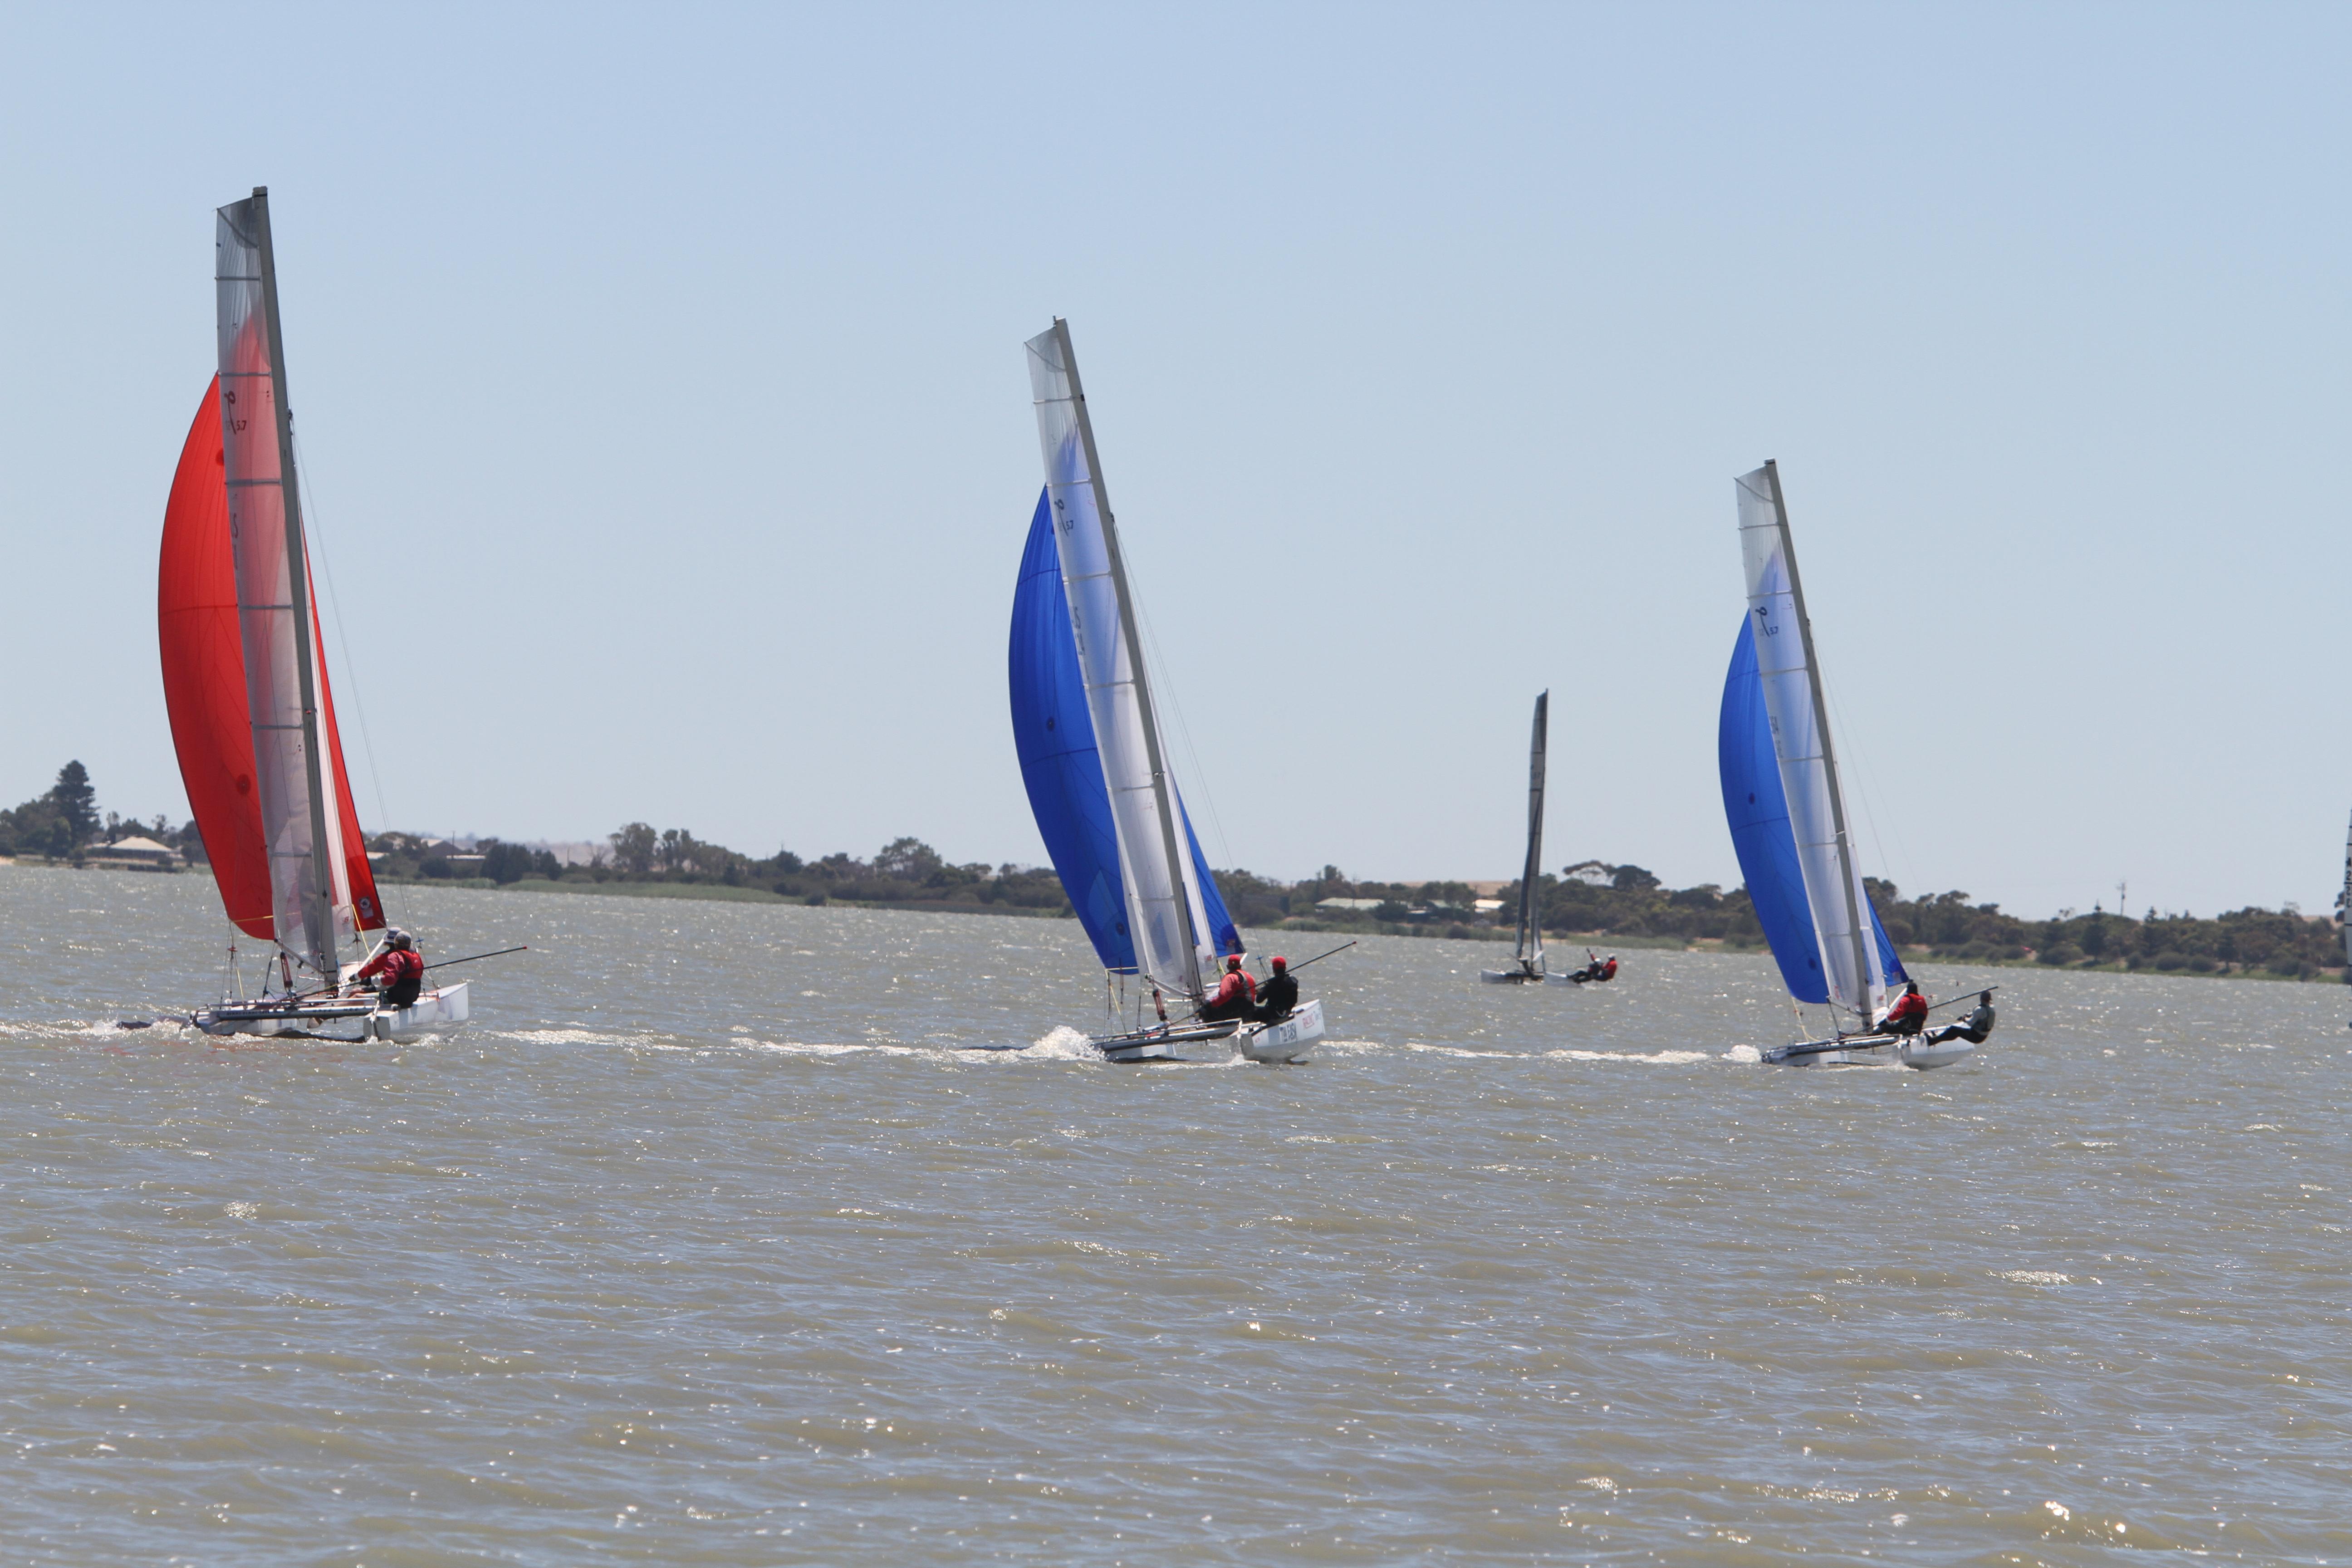 Lake Albert, Meningie provided great catamaran sailing conditions throughout the series.